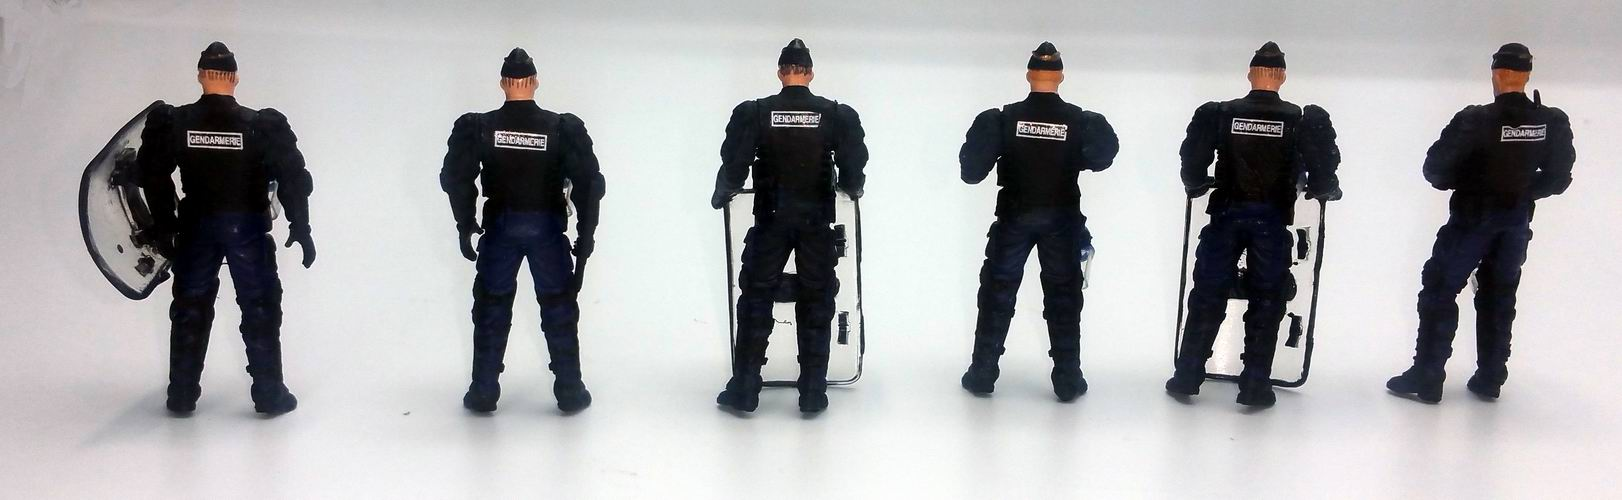 Figurines Gendarmes Mobiles police CRS 1/43